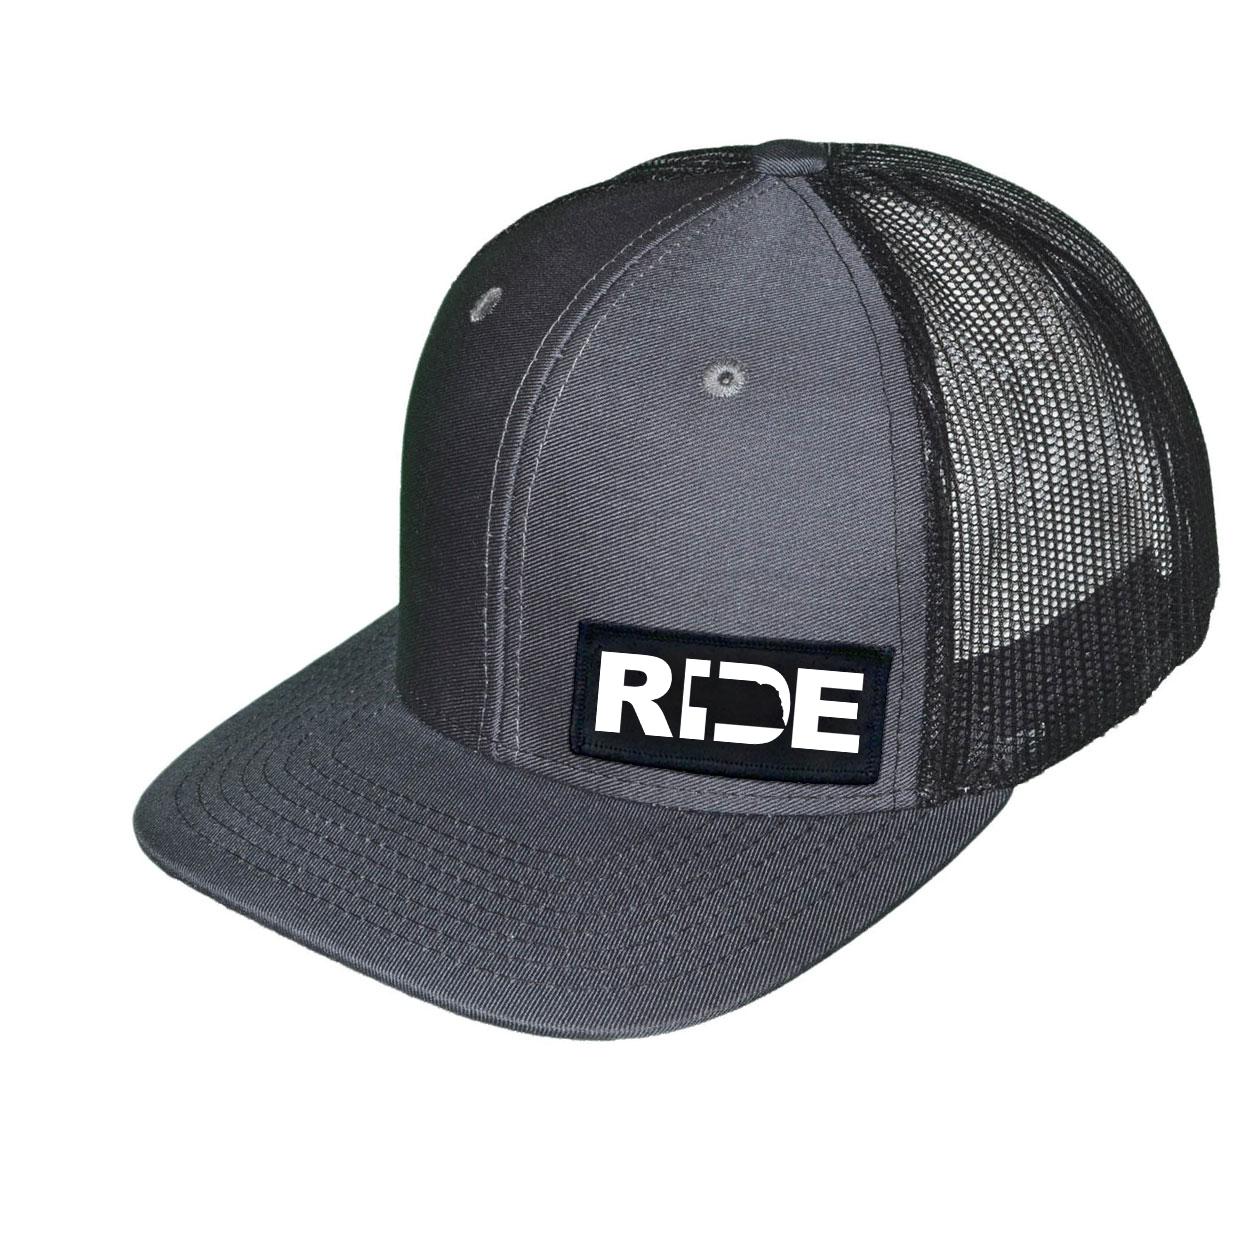 Ride Nebraska Night Out Woven Patch Snapback Trucker Hat Dark Gray/Black (White Logo)